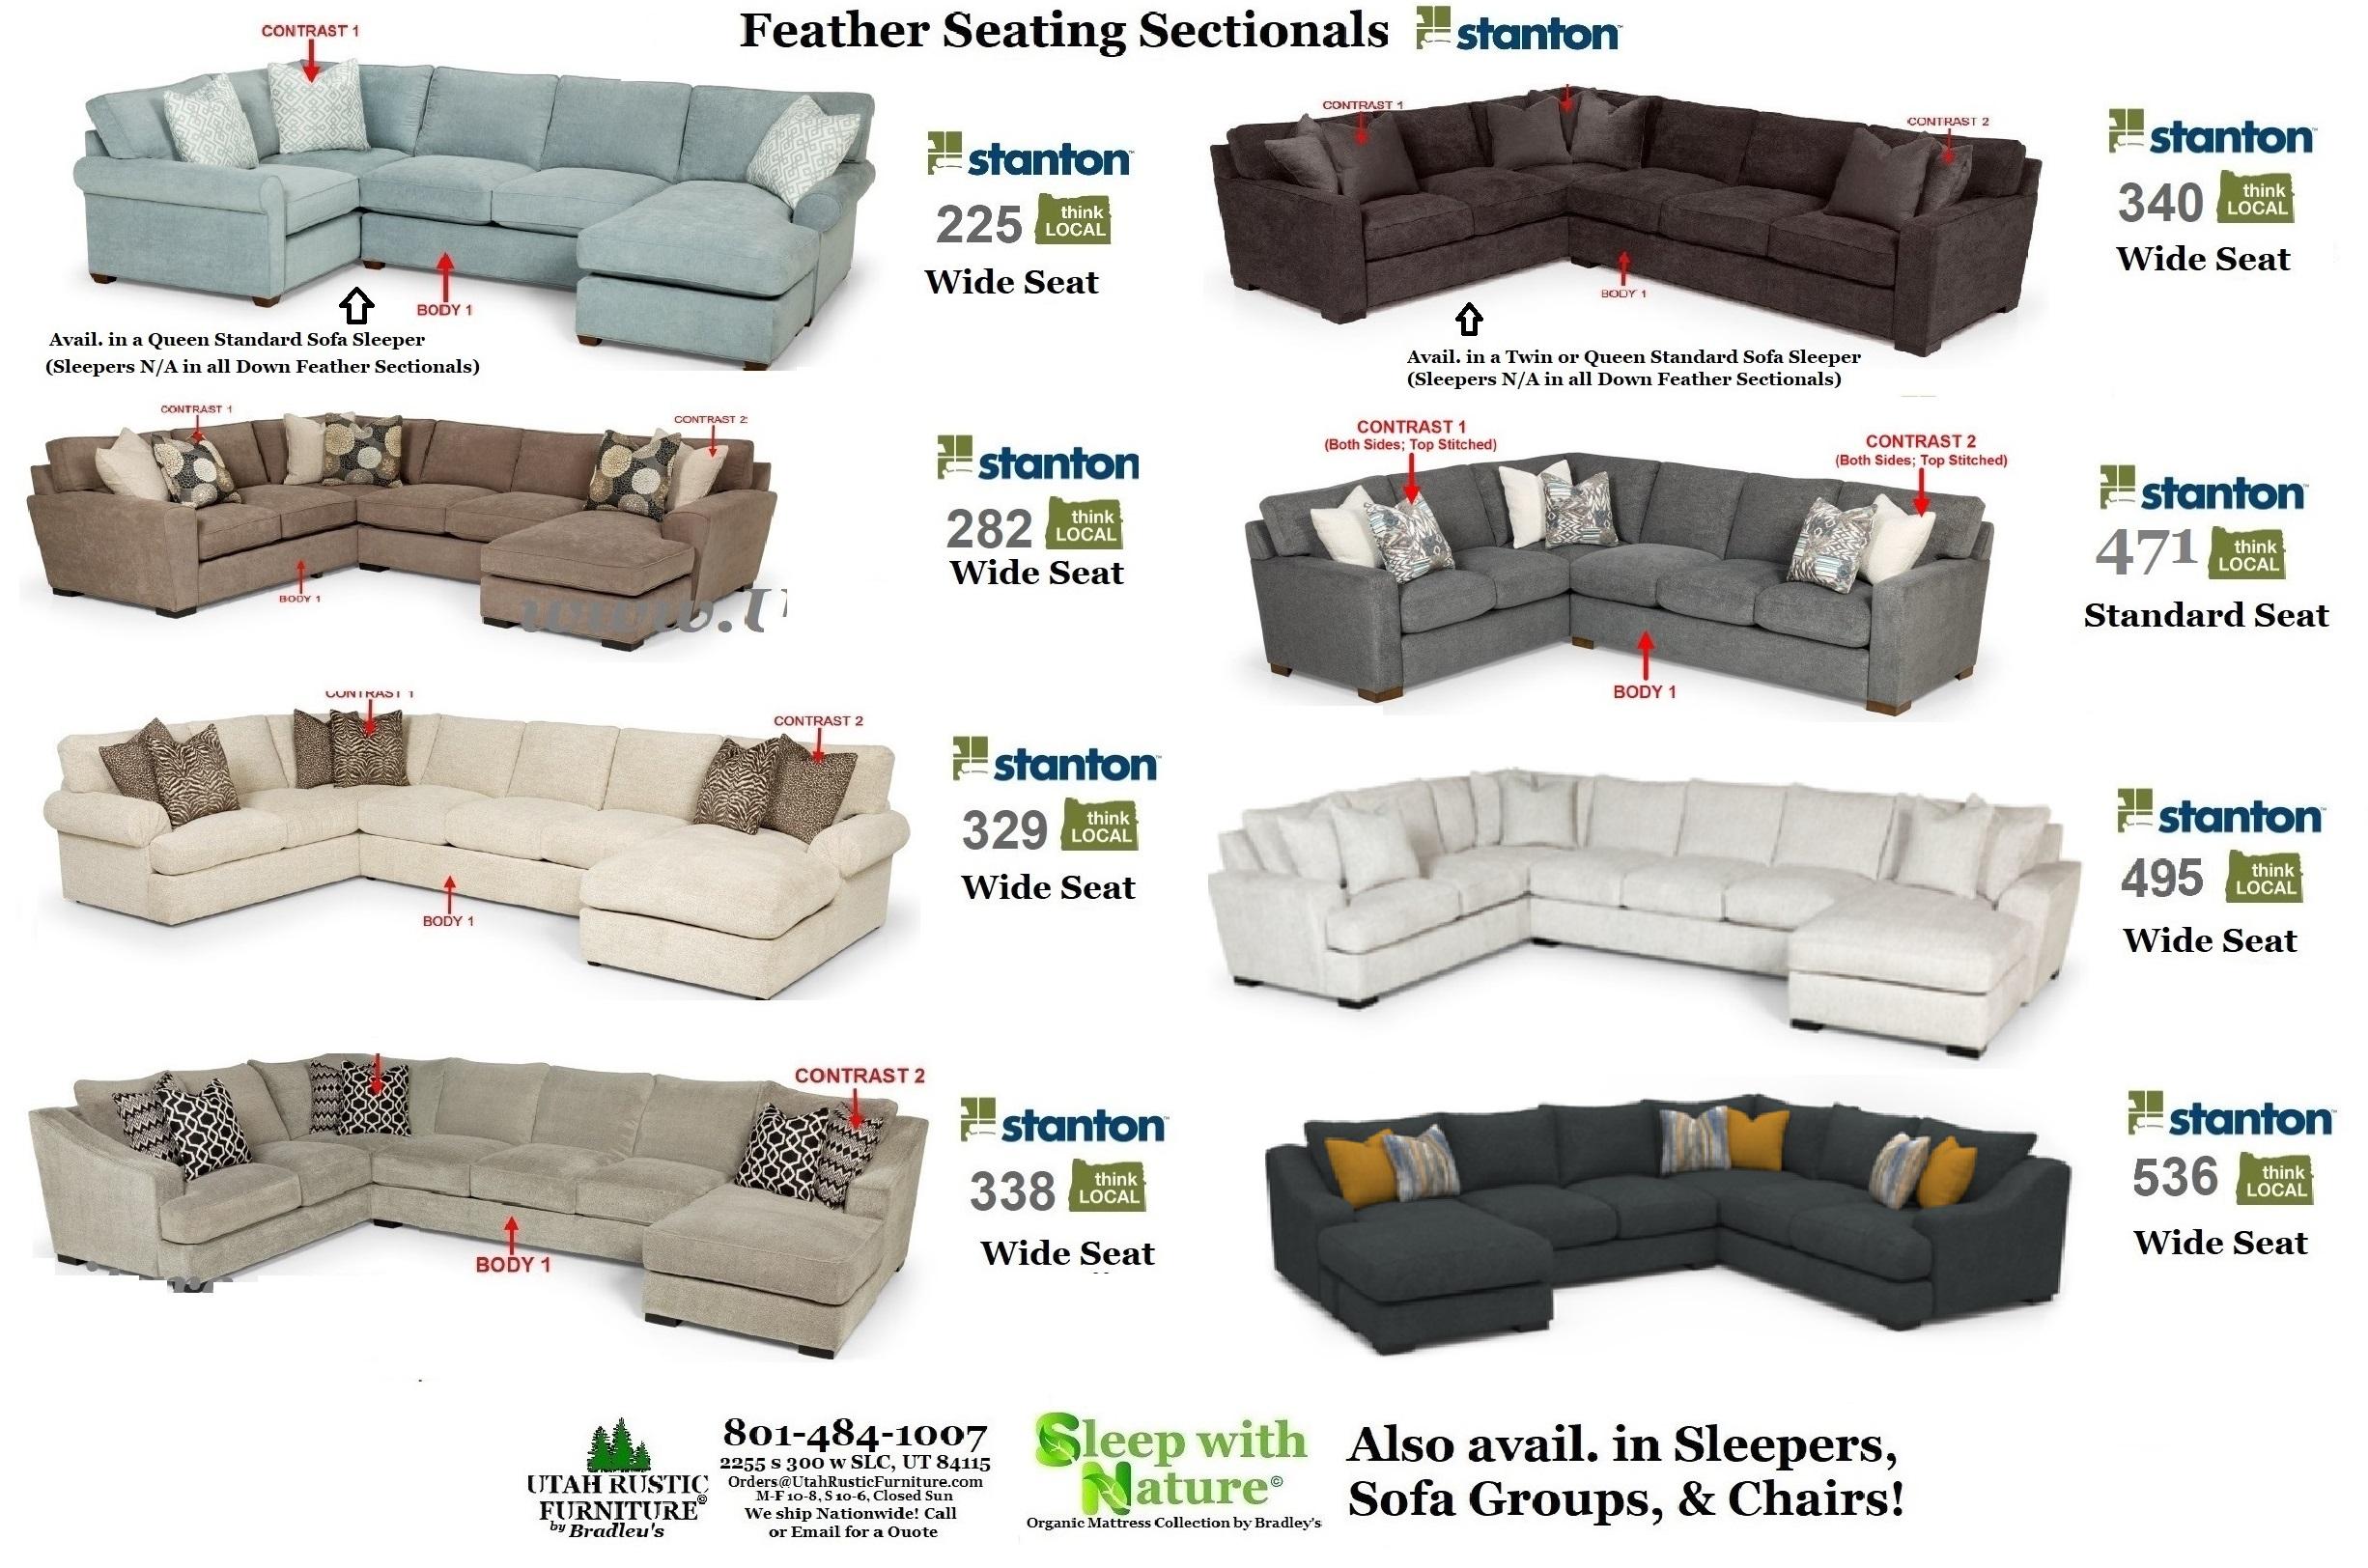 Brilliant Bradleys Furniture Etc Stanton Fabric And Leather Sofas Home Interior And Landscaping Ponolsignezvosmurscom